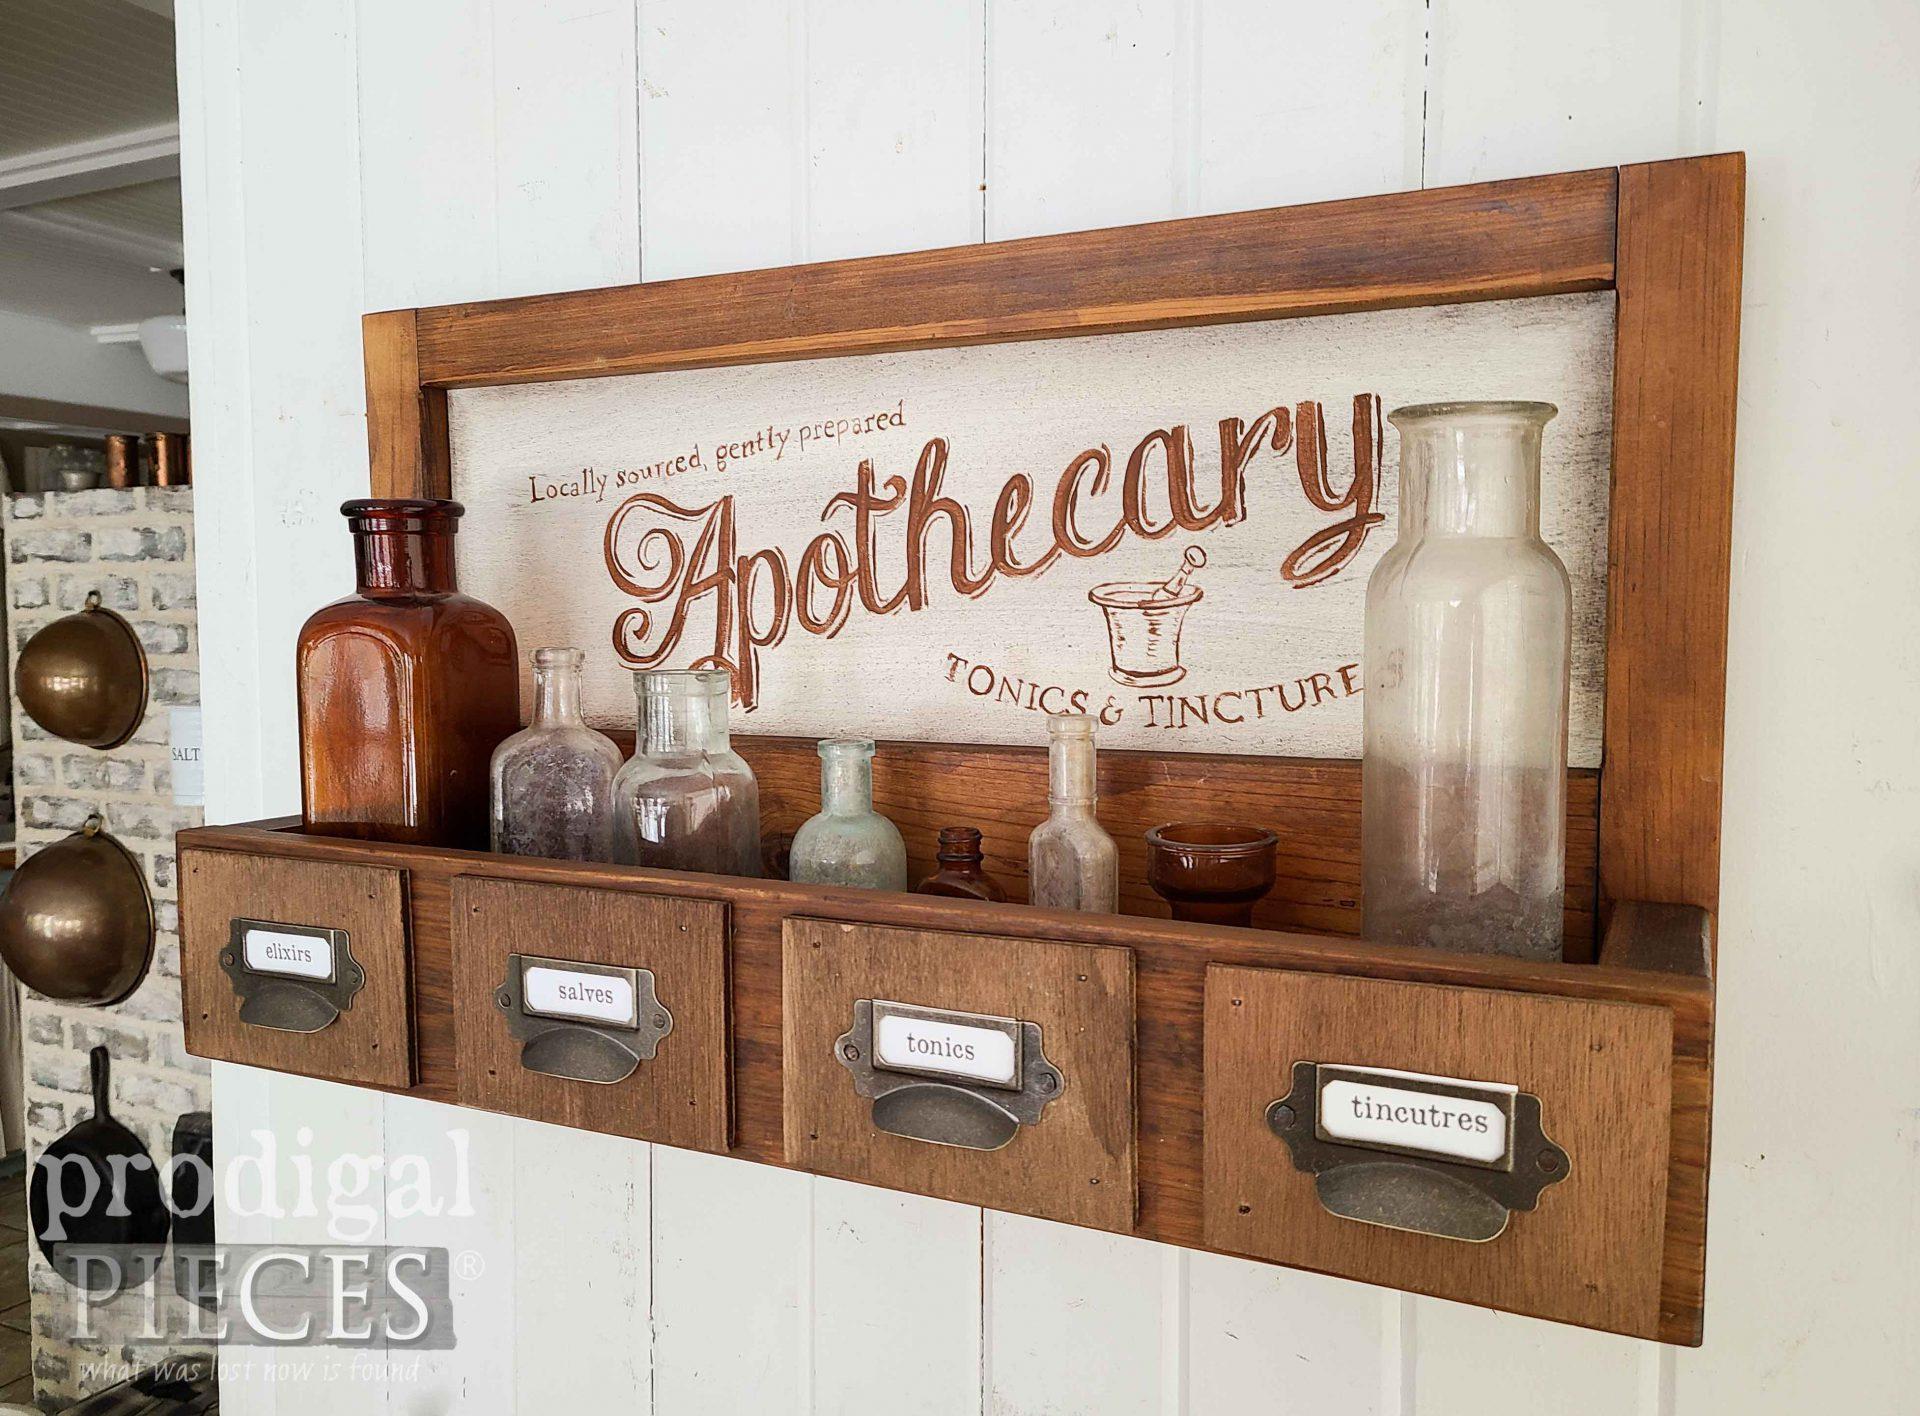 Farmhouse Apothecary Shelf by Larissa of Prodigal Pieces | prodigalpieces.com #prodigalpieces #diy #home #farmhouse